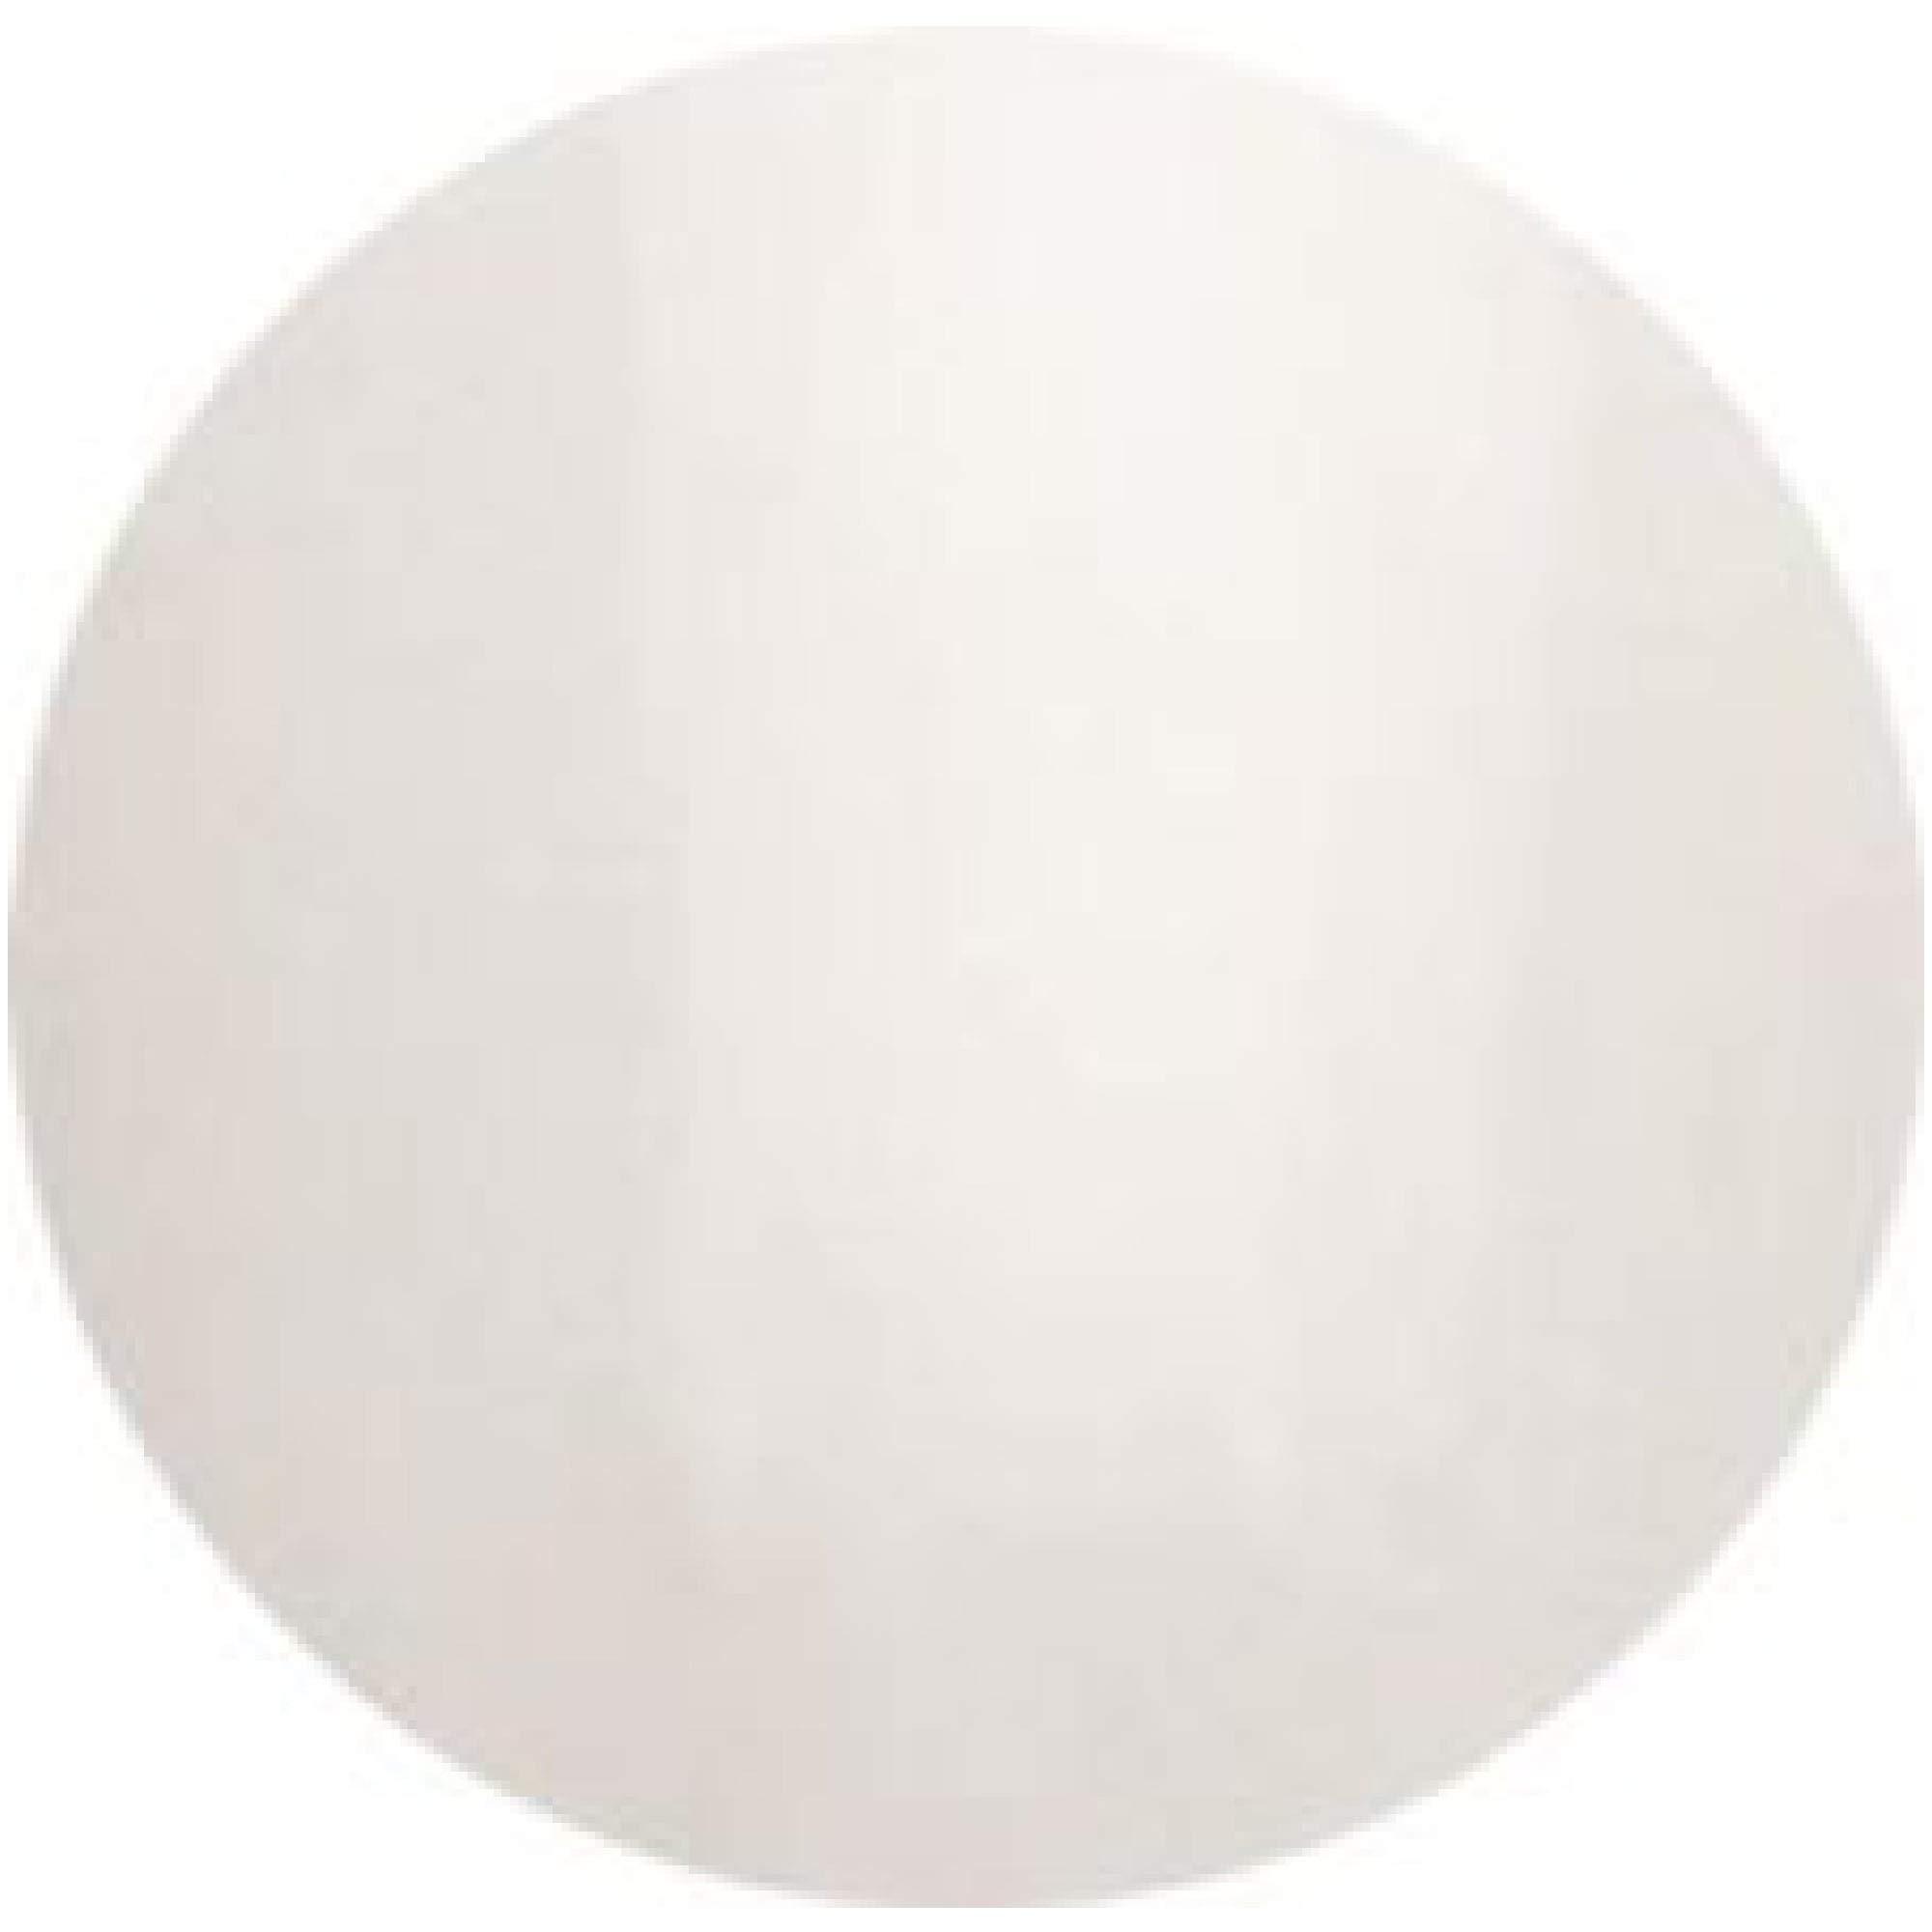 Entity One Color Couture Gel Polish - Spotlight - 0.5oz / 15ml